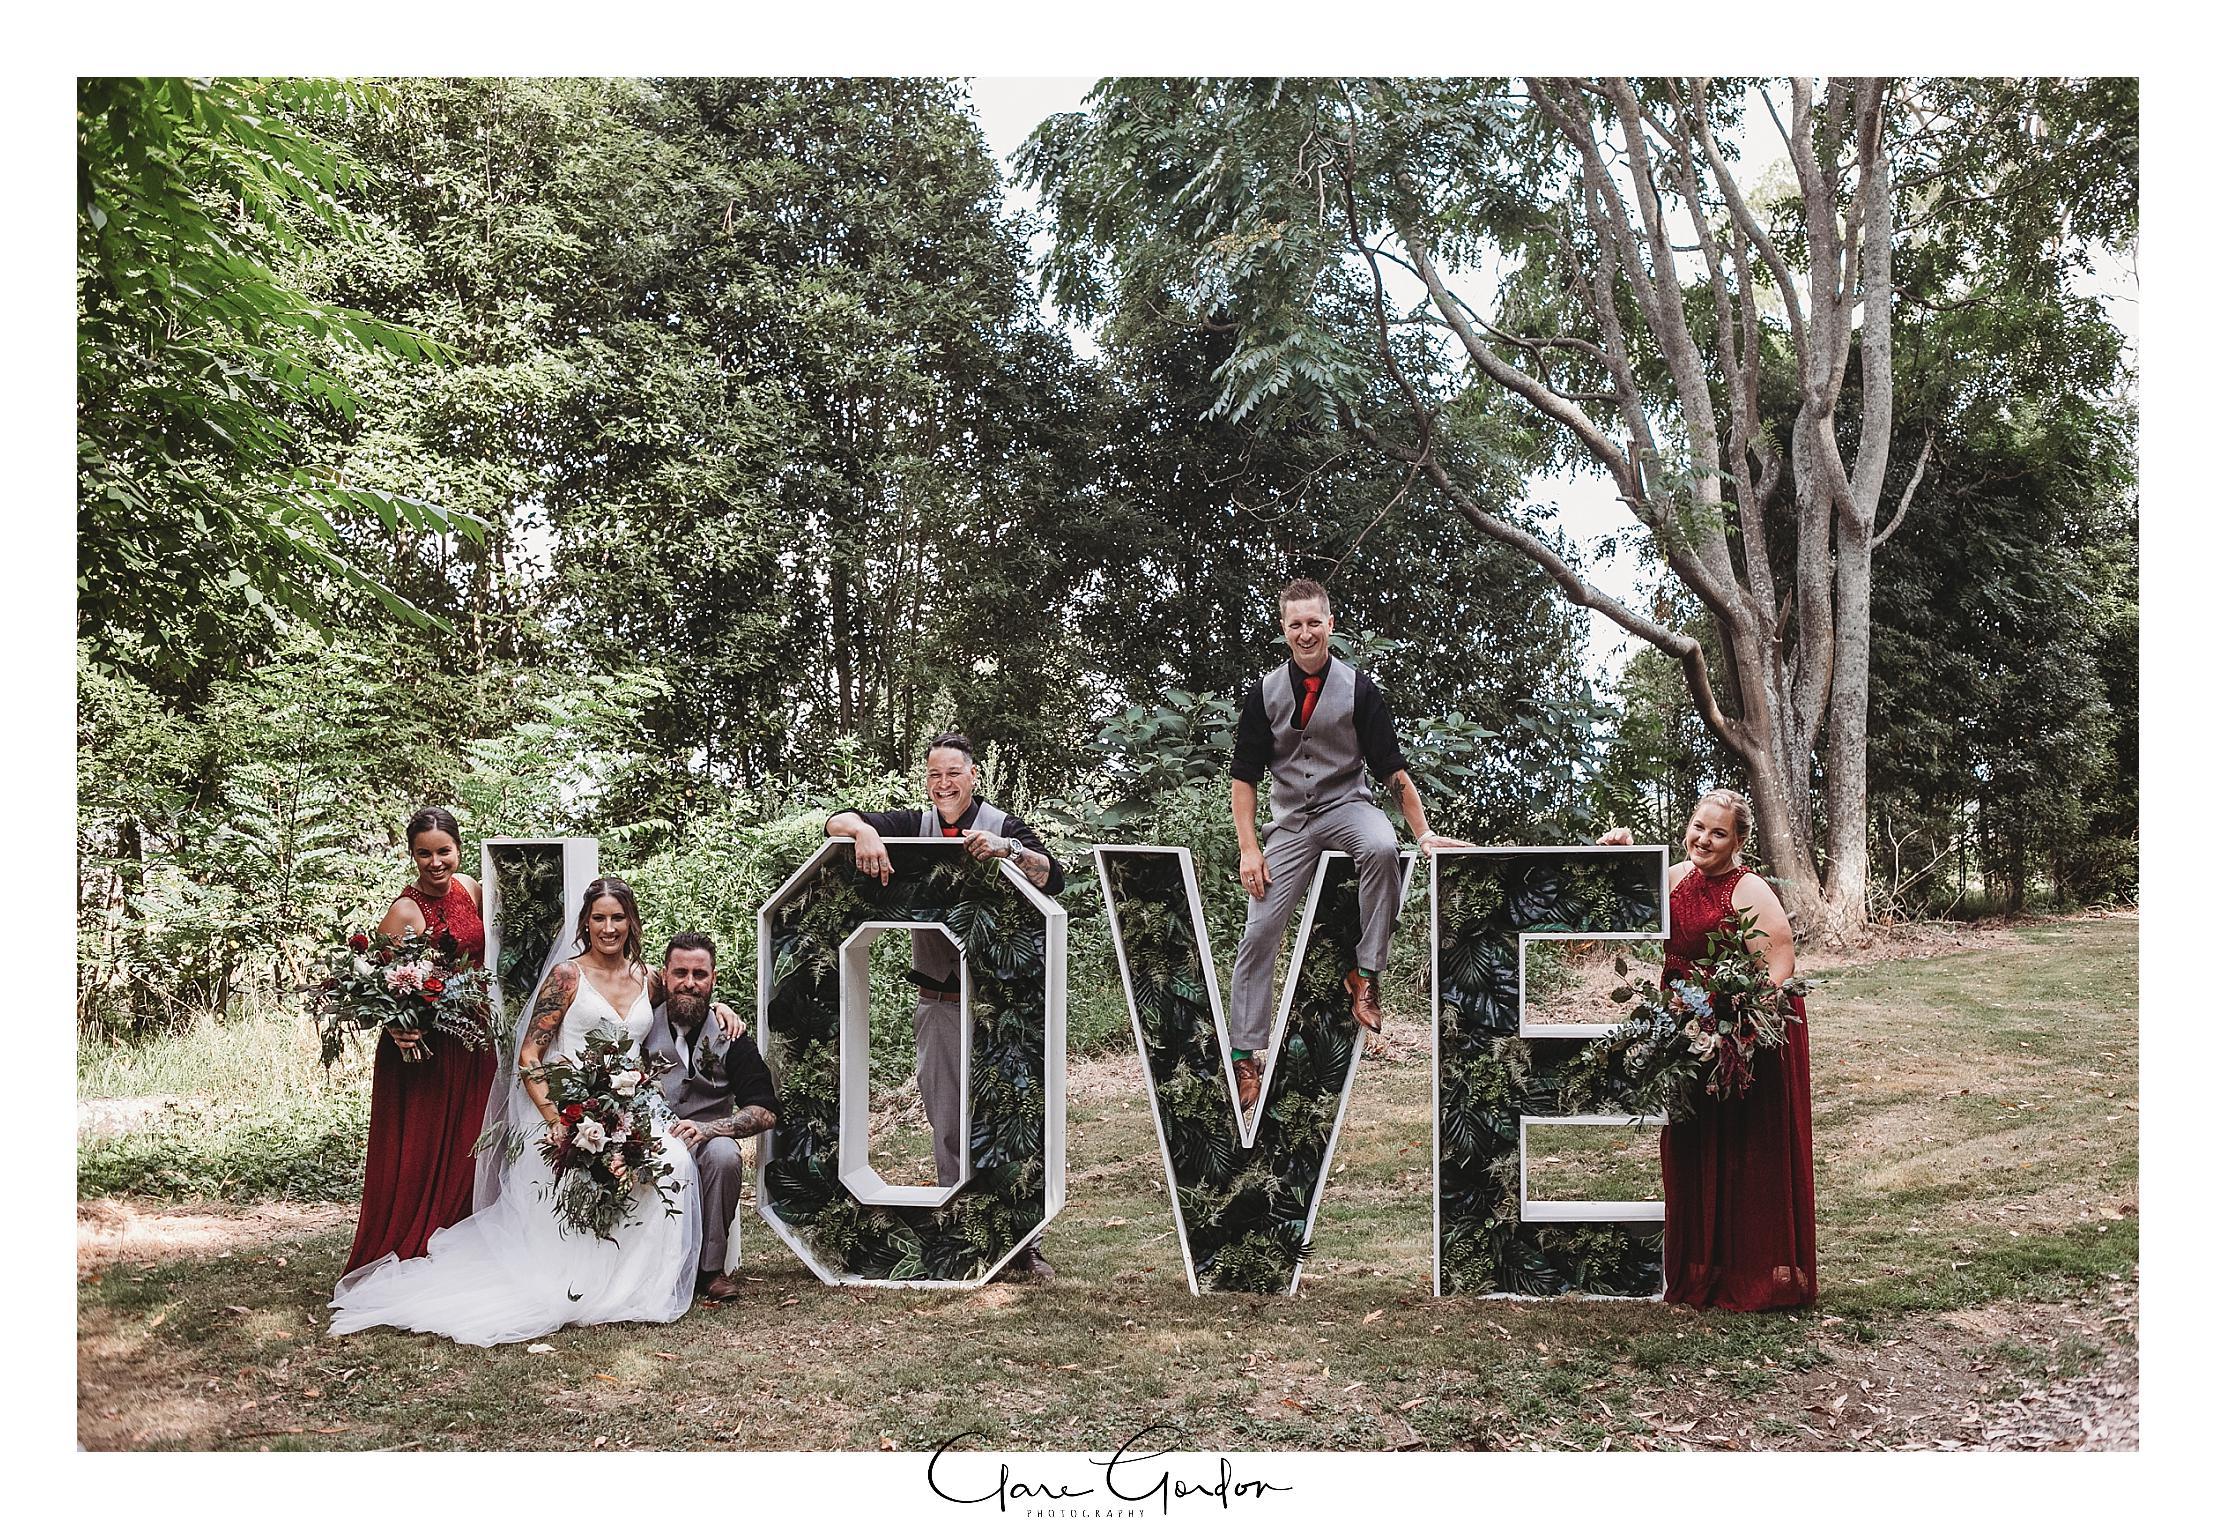 Waikato-wedding-photographer-Forest-weddnig-Hamilton-wedding-Newzealand (83).jpg